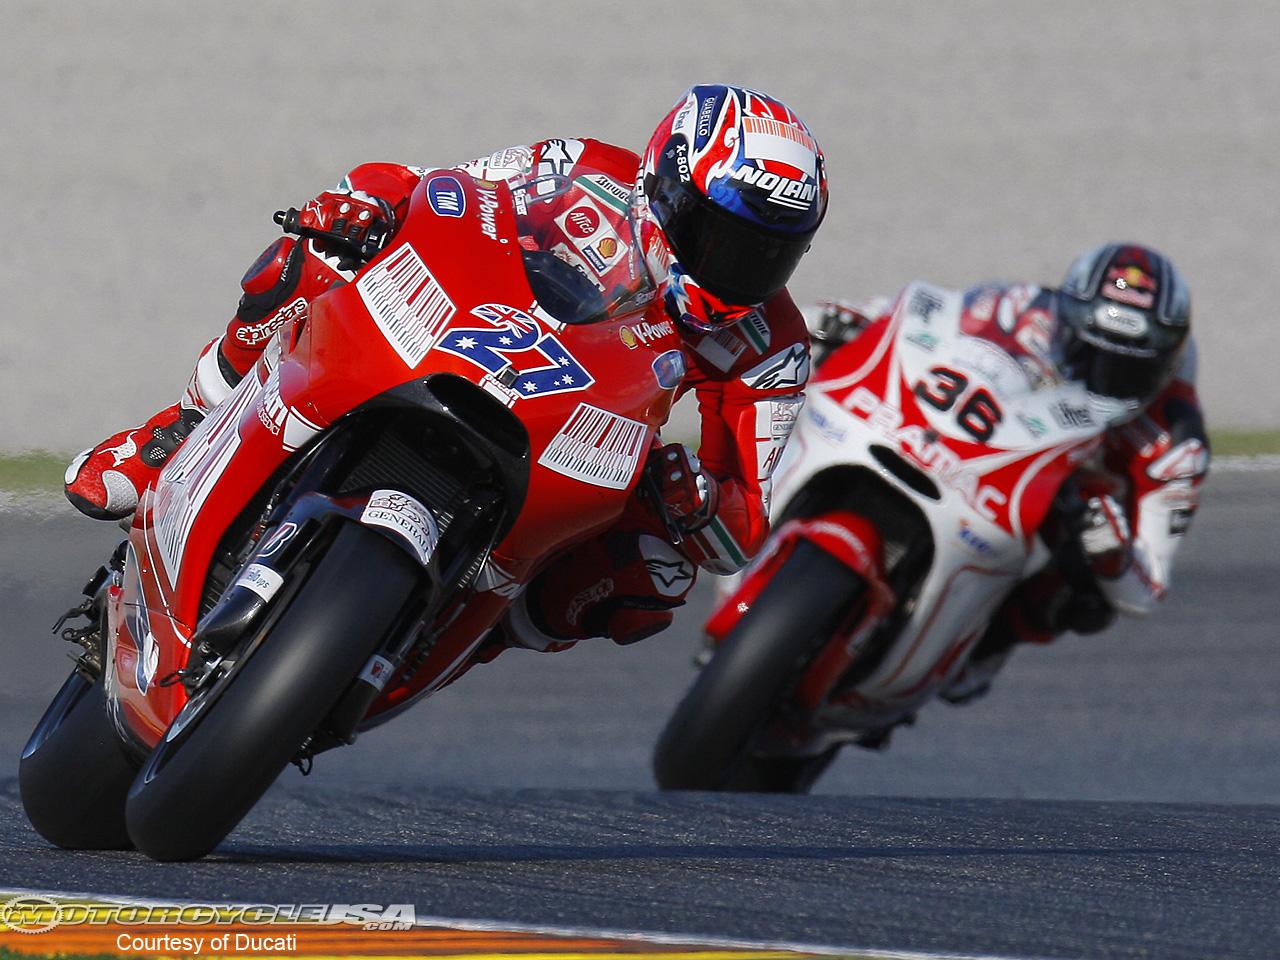 Download High quality MotoGP MotoGP Wallpaper Num 8 1280 x 960 1280x960